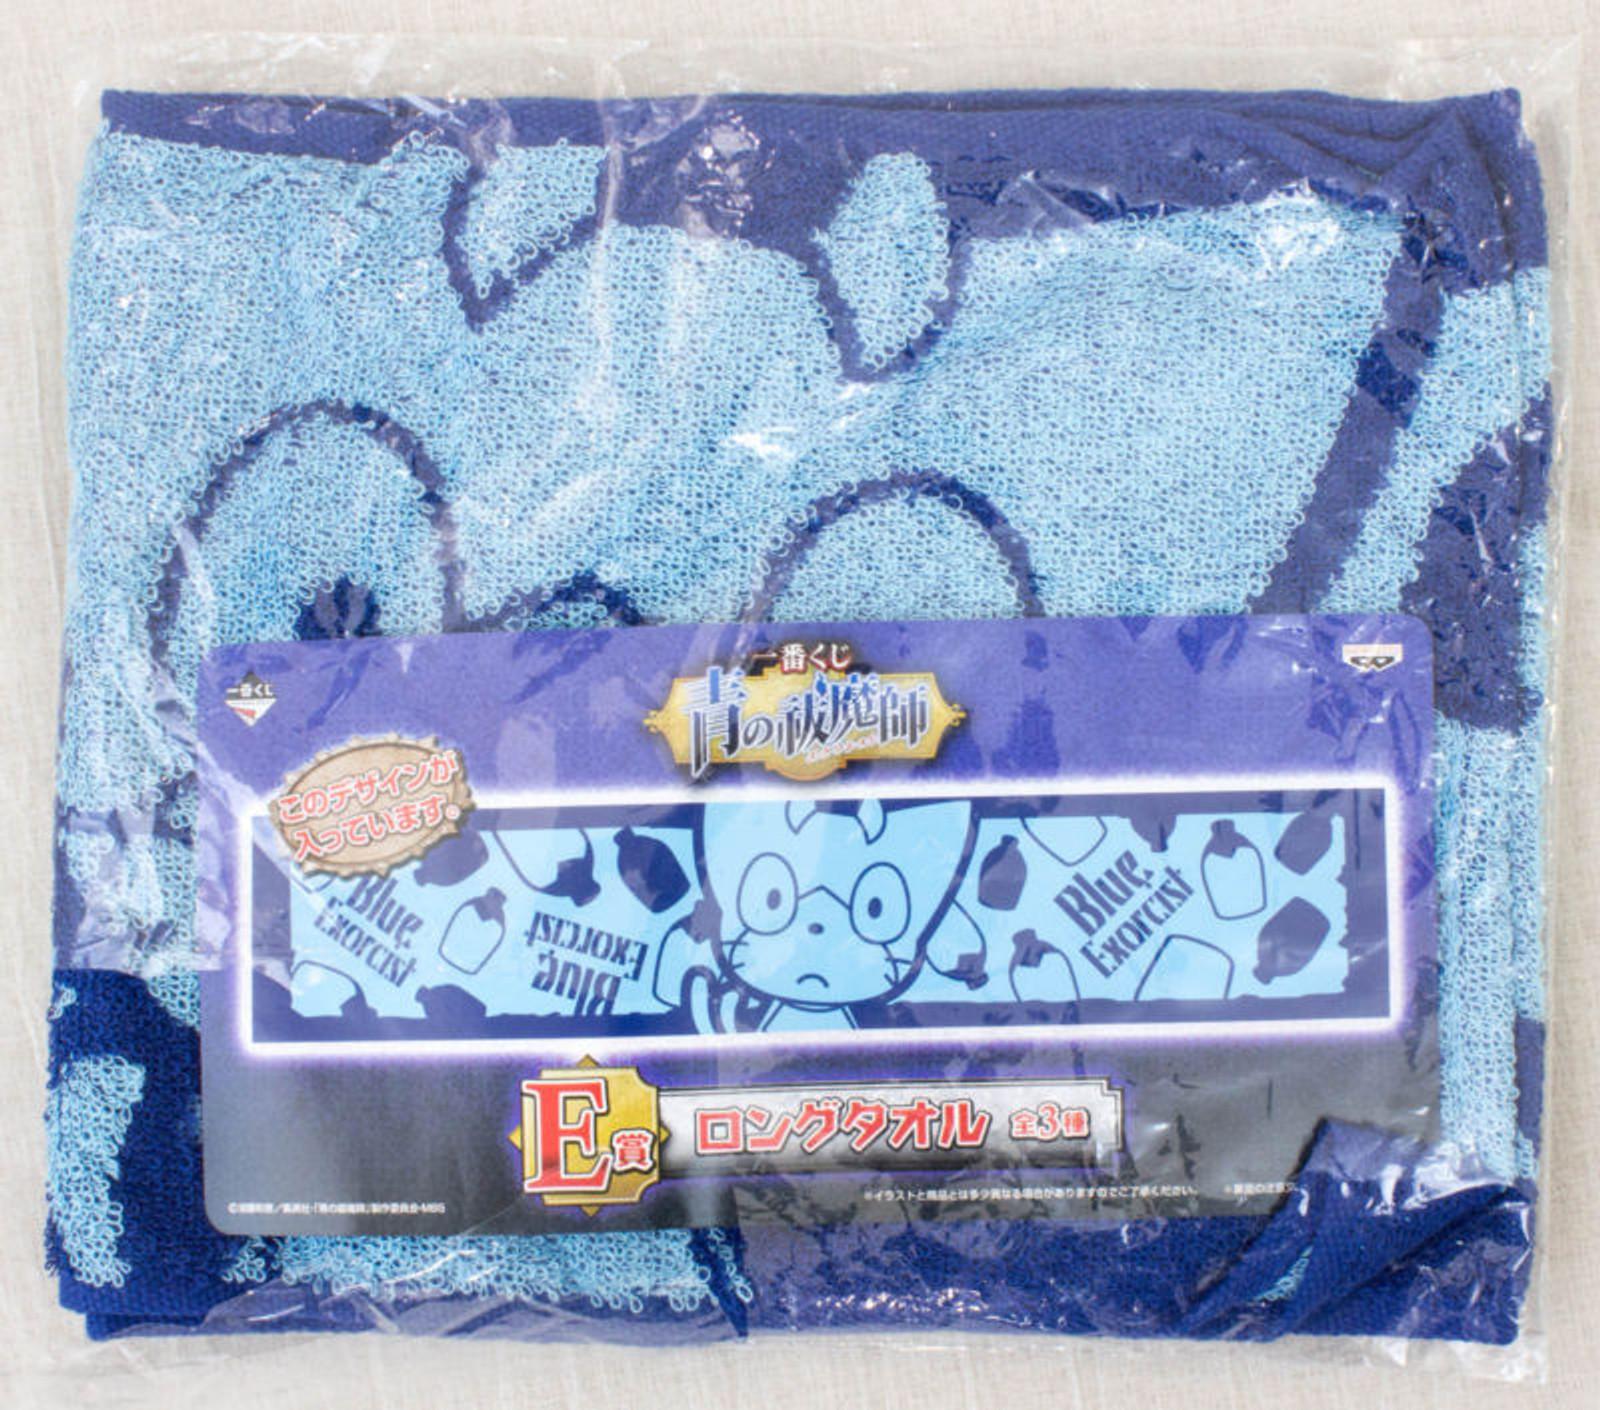 Blue Exorcist Kuro Long Towel 90x20cm Cait Sith Cat Banoresto JAPAN ANIME JUMP